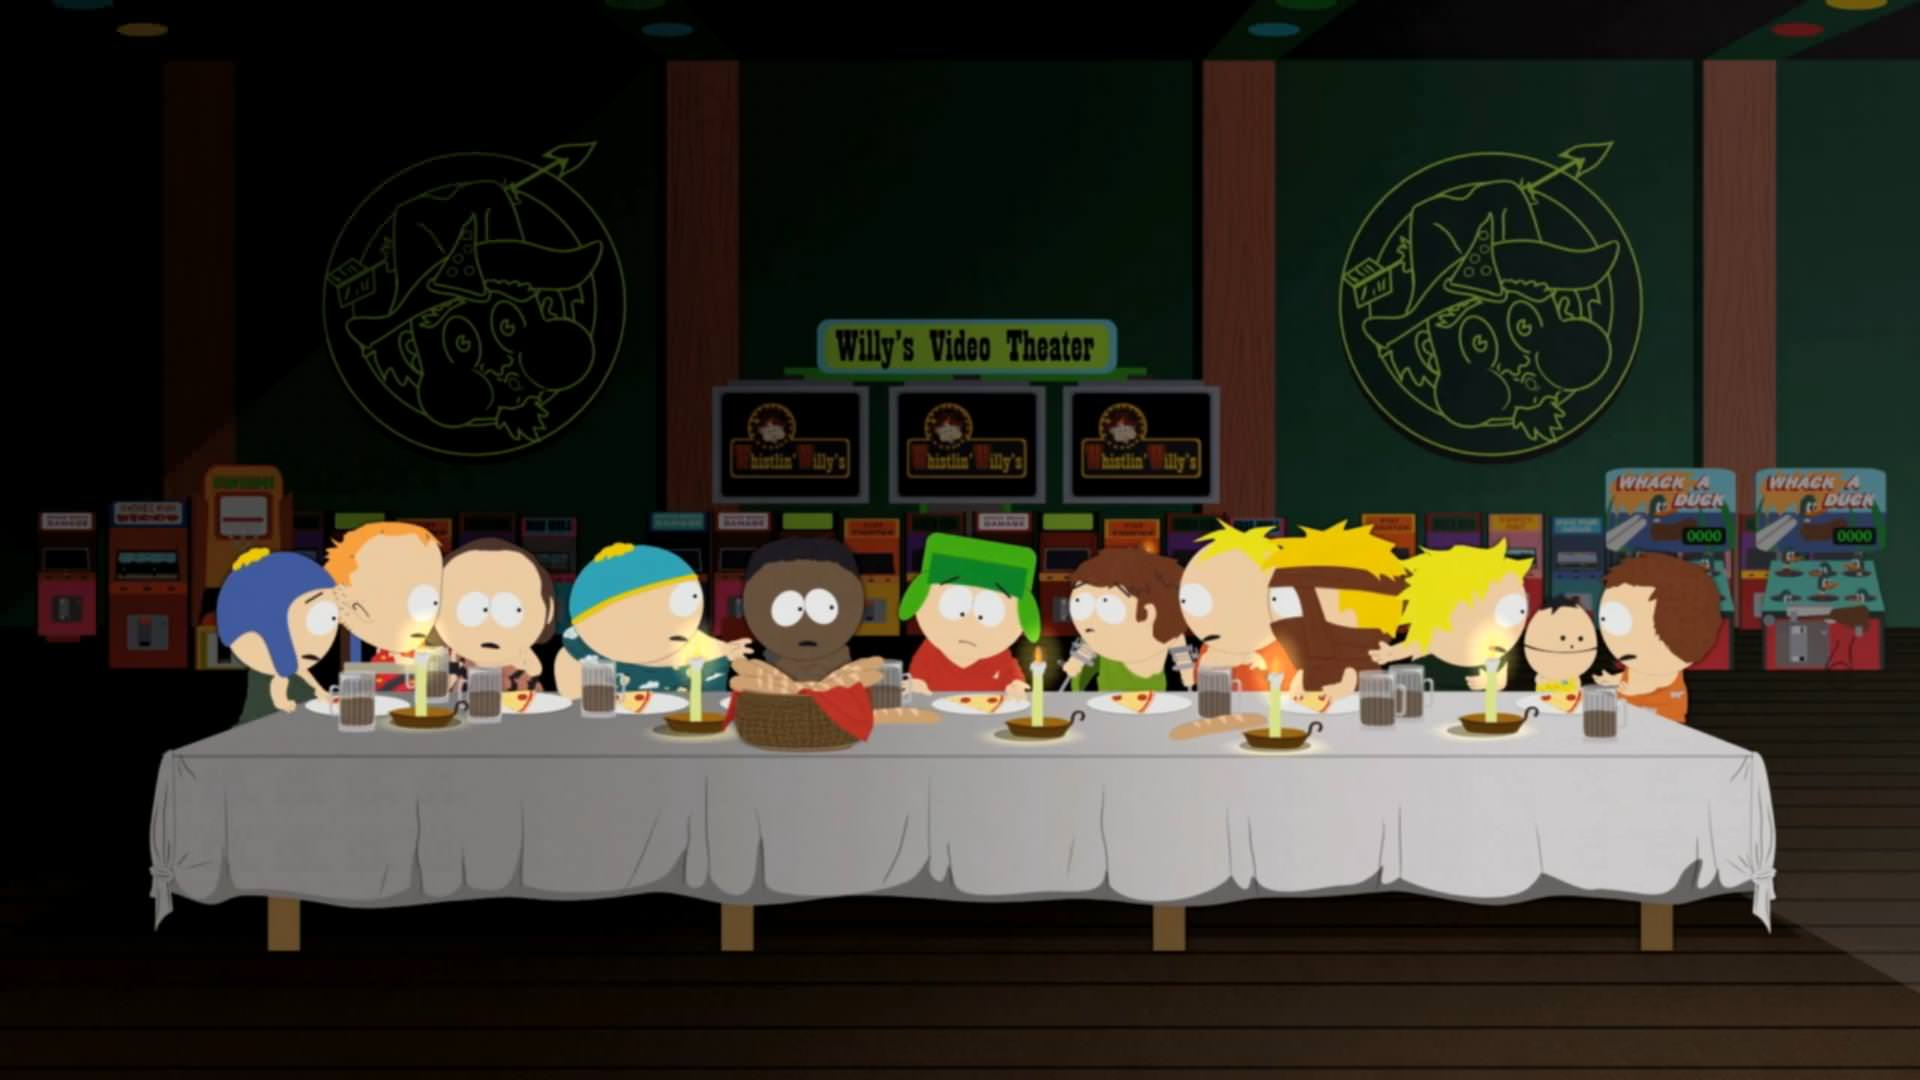 Jesus Wallpaper Hd 3d Download South Park Wallpapers Hd A38 Hd Desktop Wallpapers 4k Hd